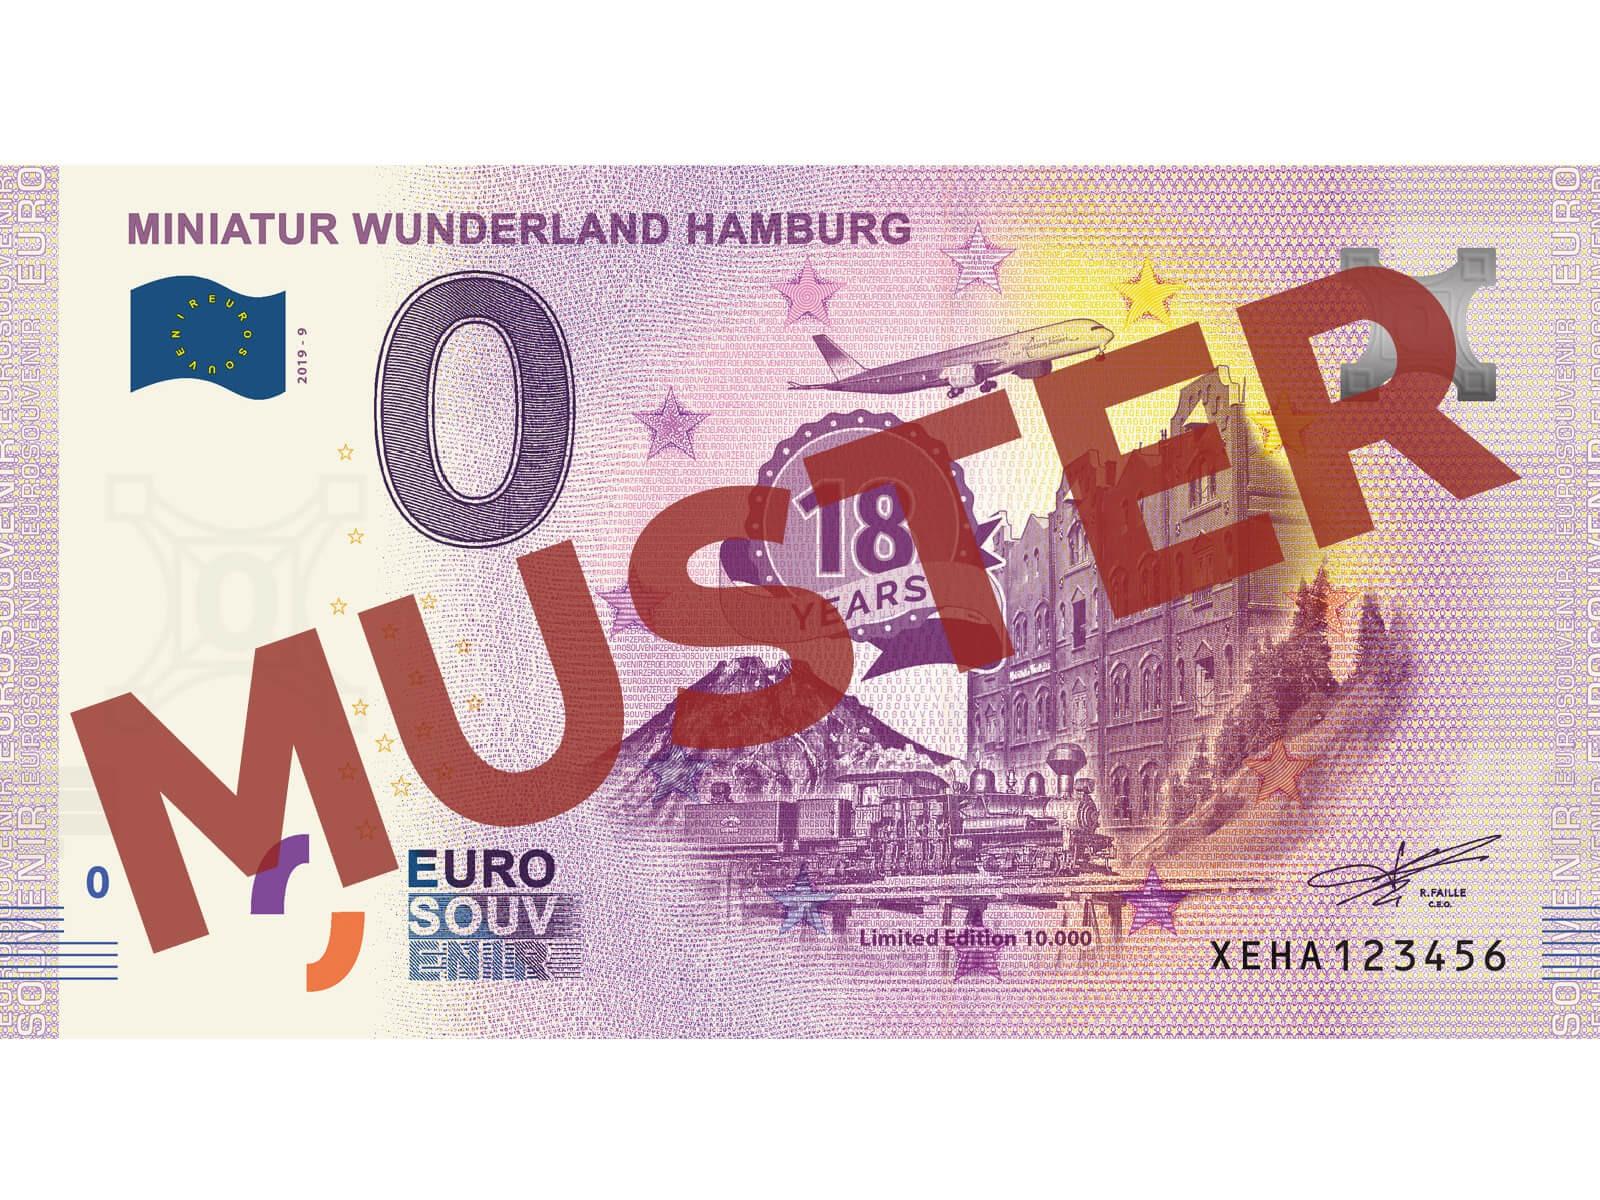 "Euro-Souvenir-Banknote Motif ""18 Years Miniatur Wunderland"" (2019-9)"